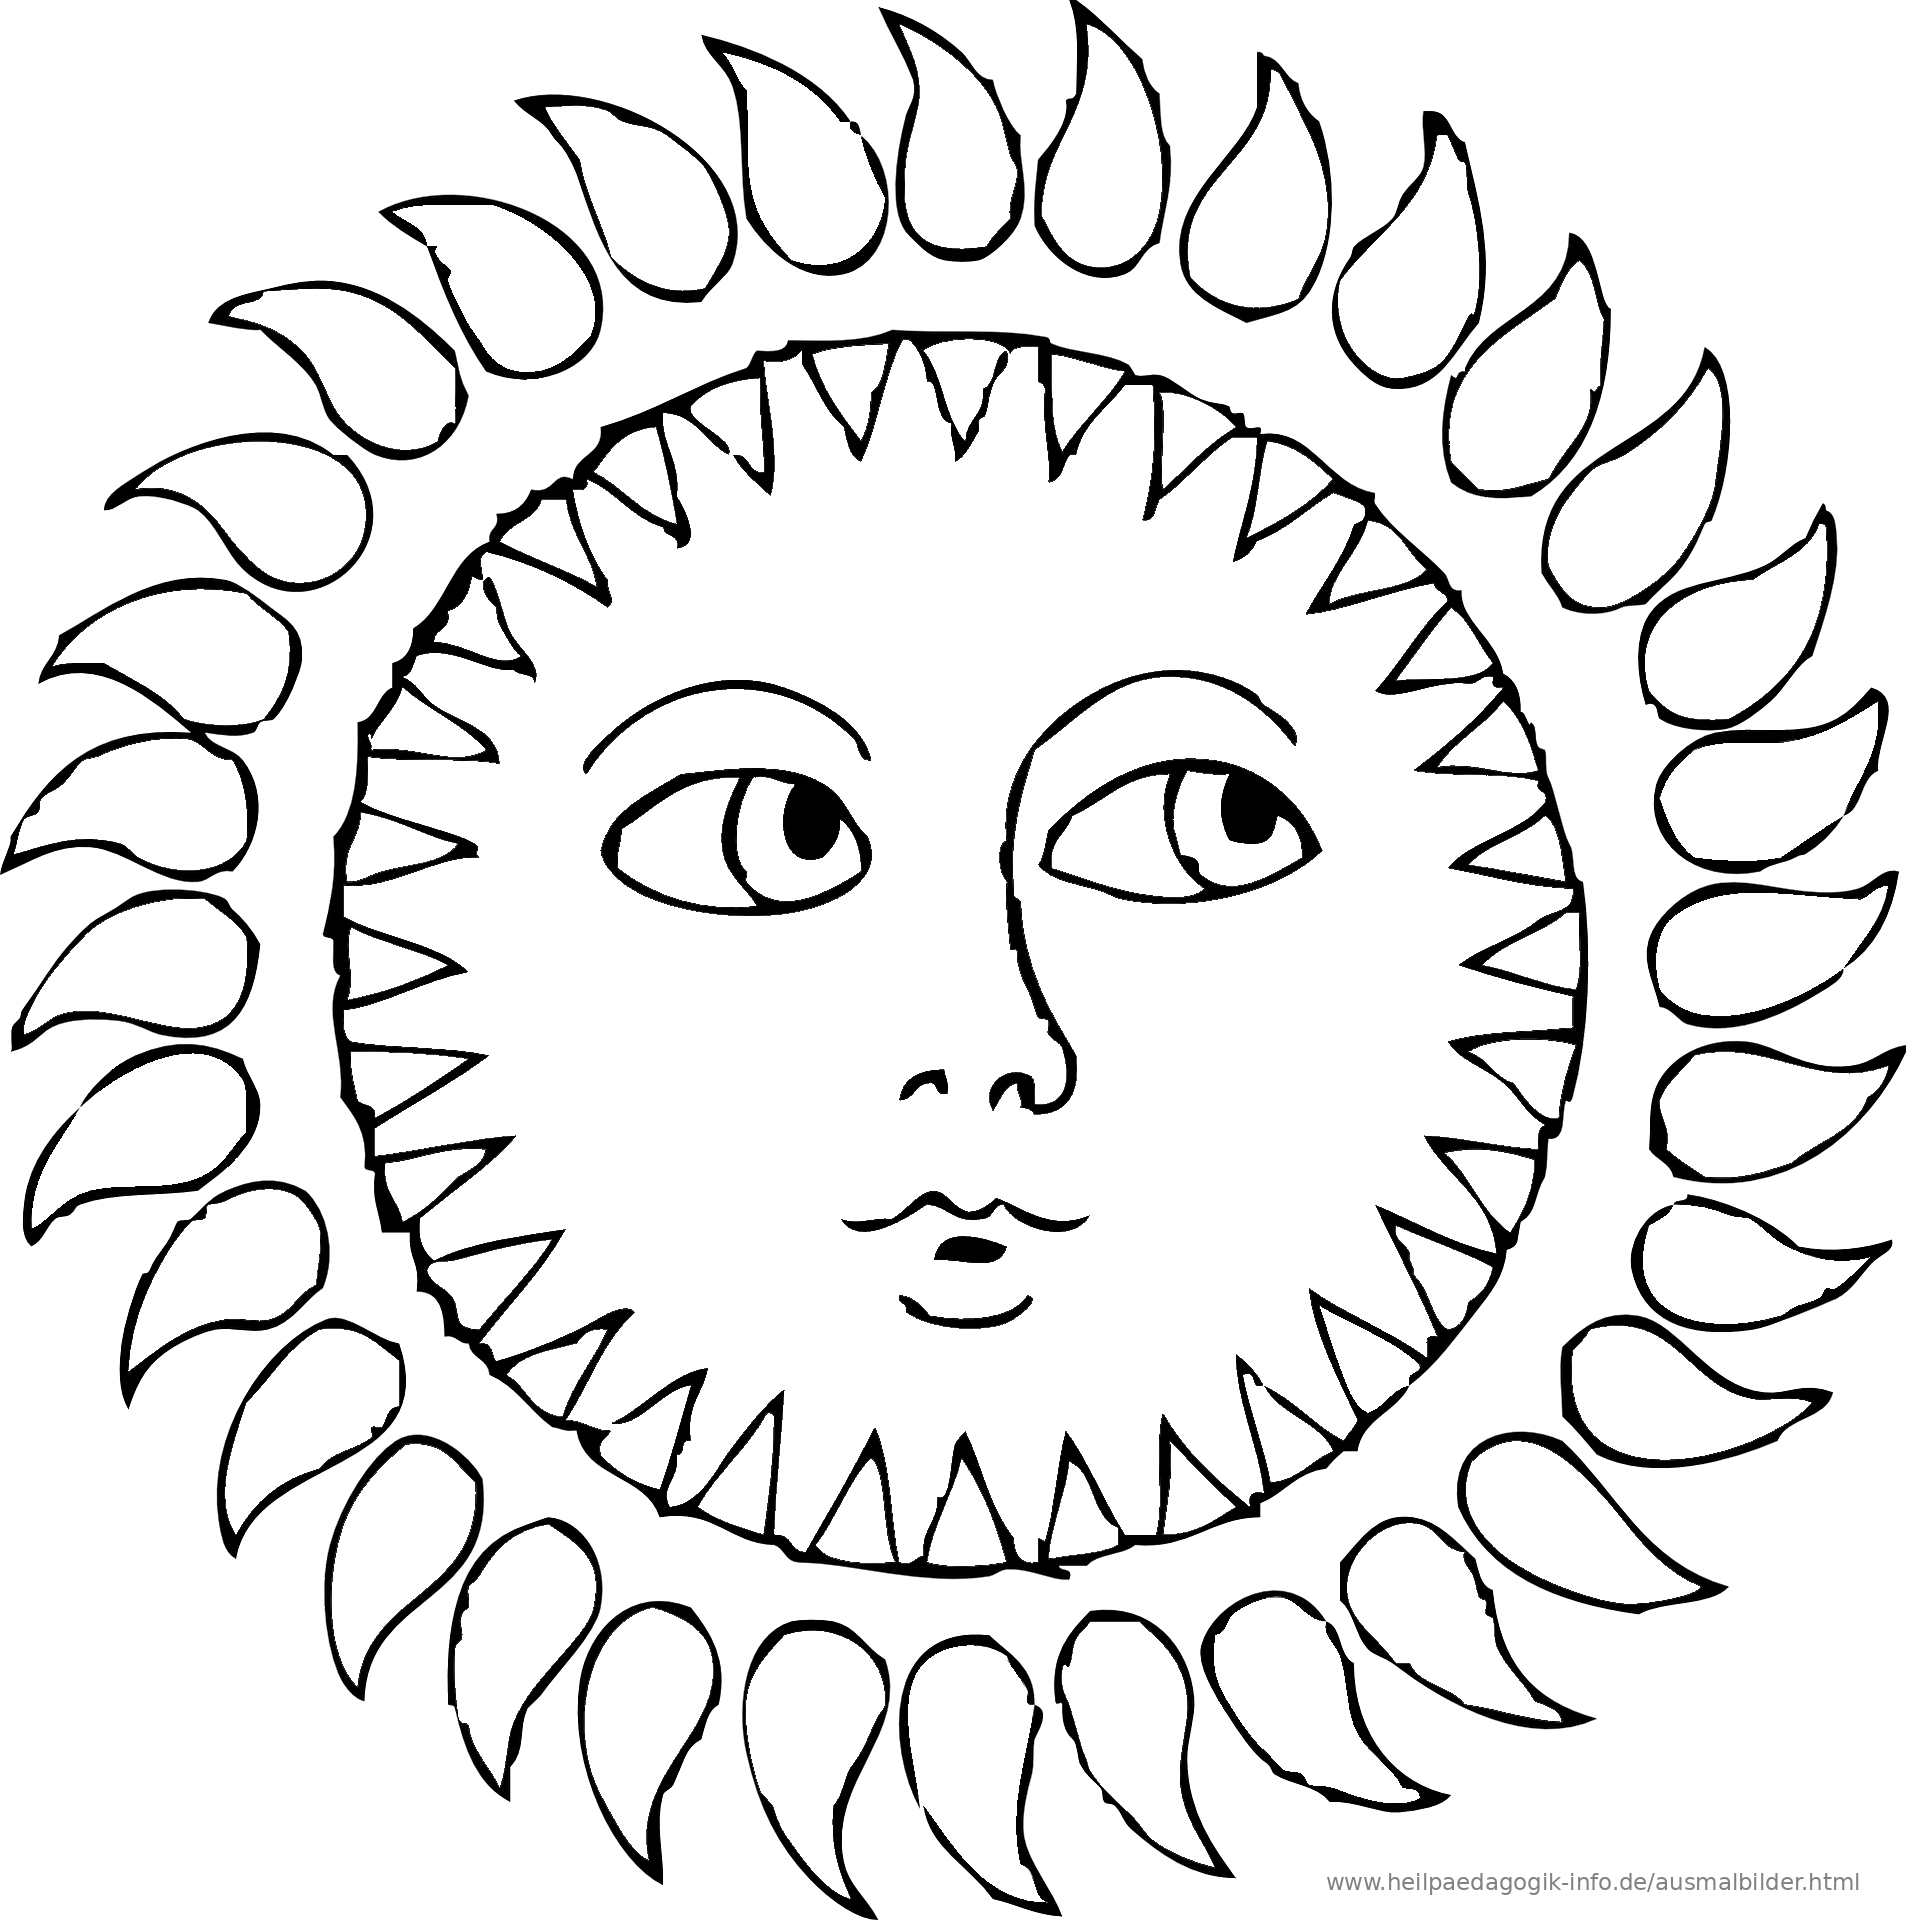 Sonnenschirm malvorlage  Sonnenschirm Malvorlage | ambiznes.com